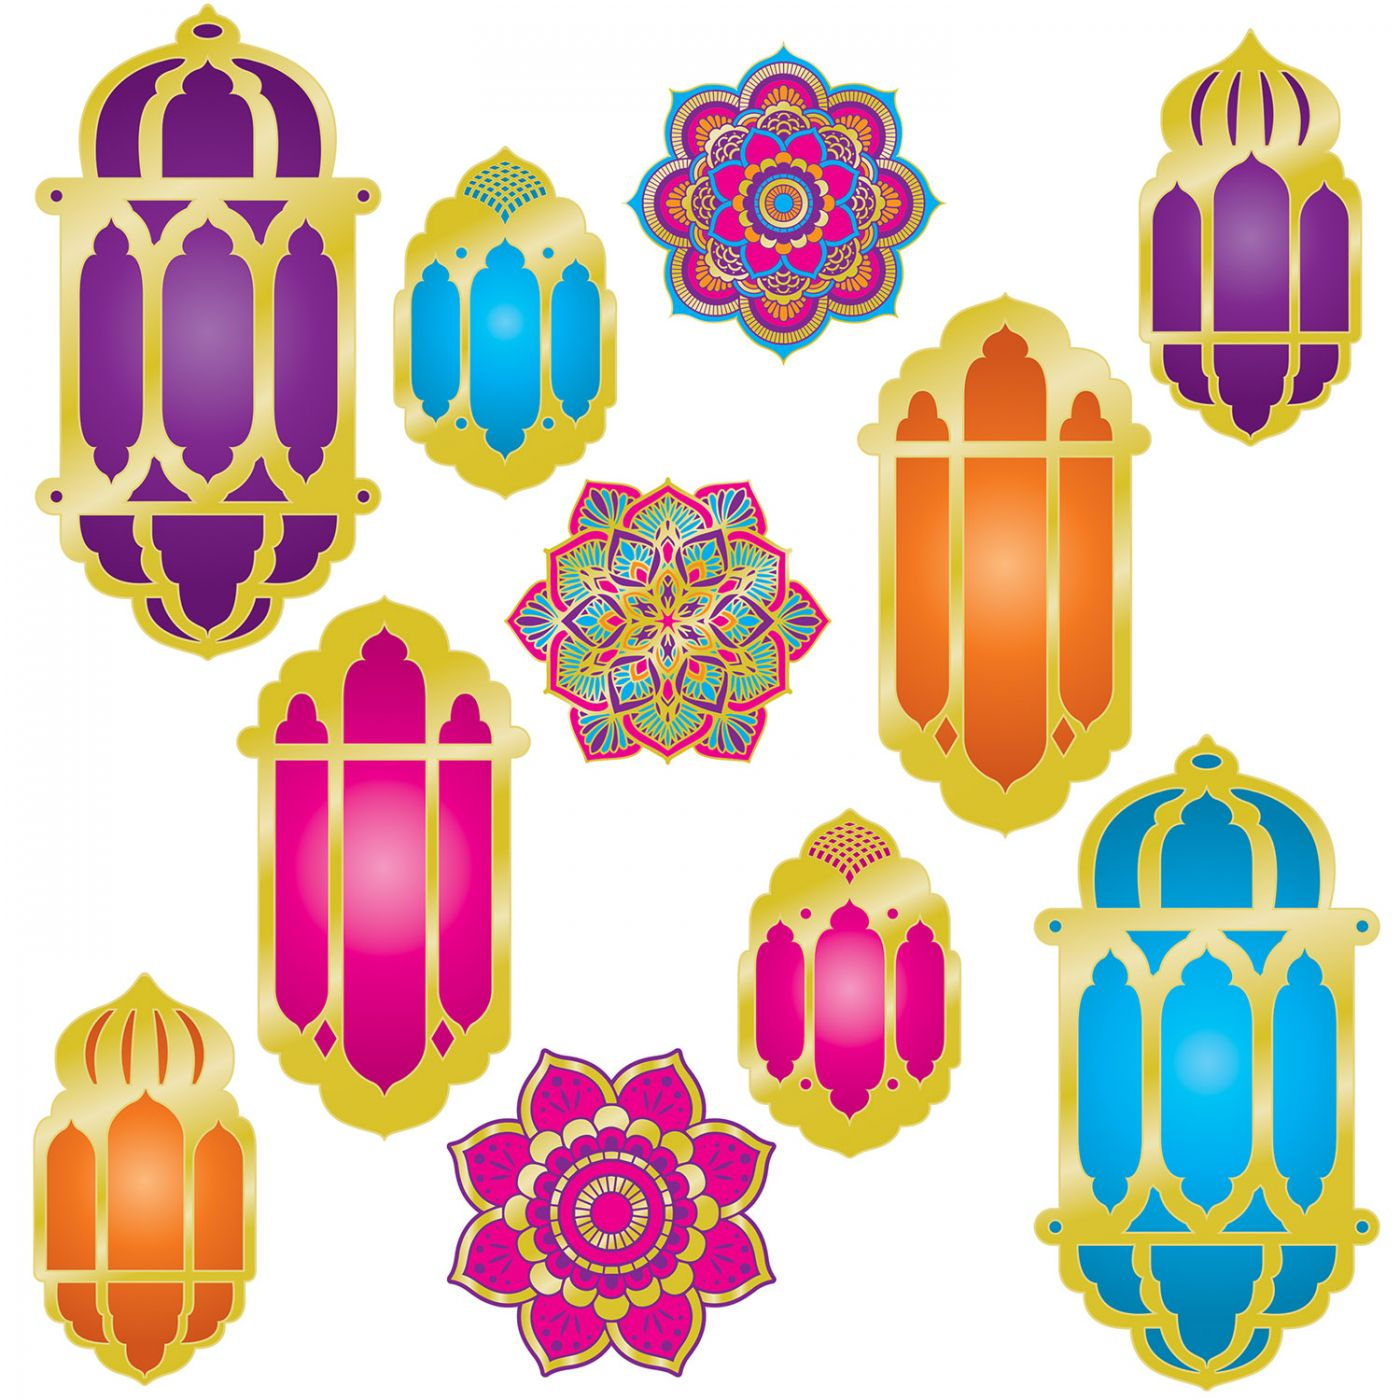 Foil Lantern & Mandala Cutouts image